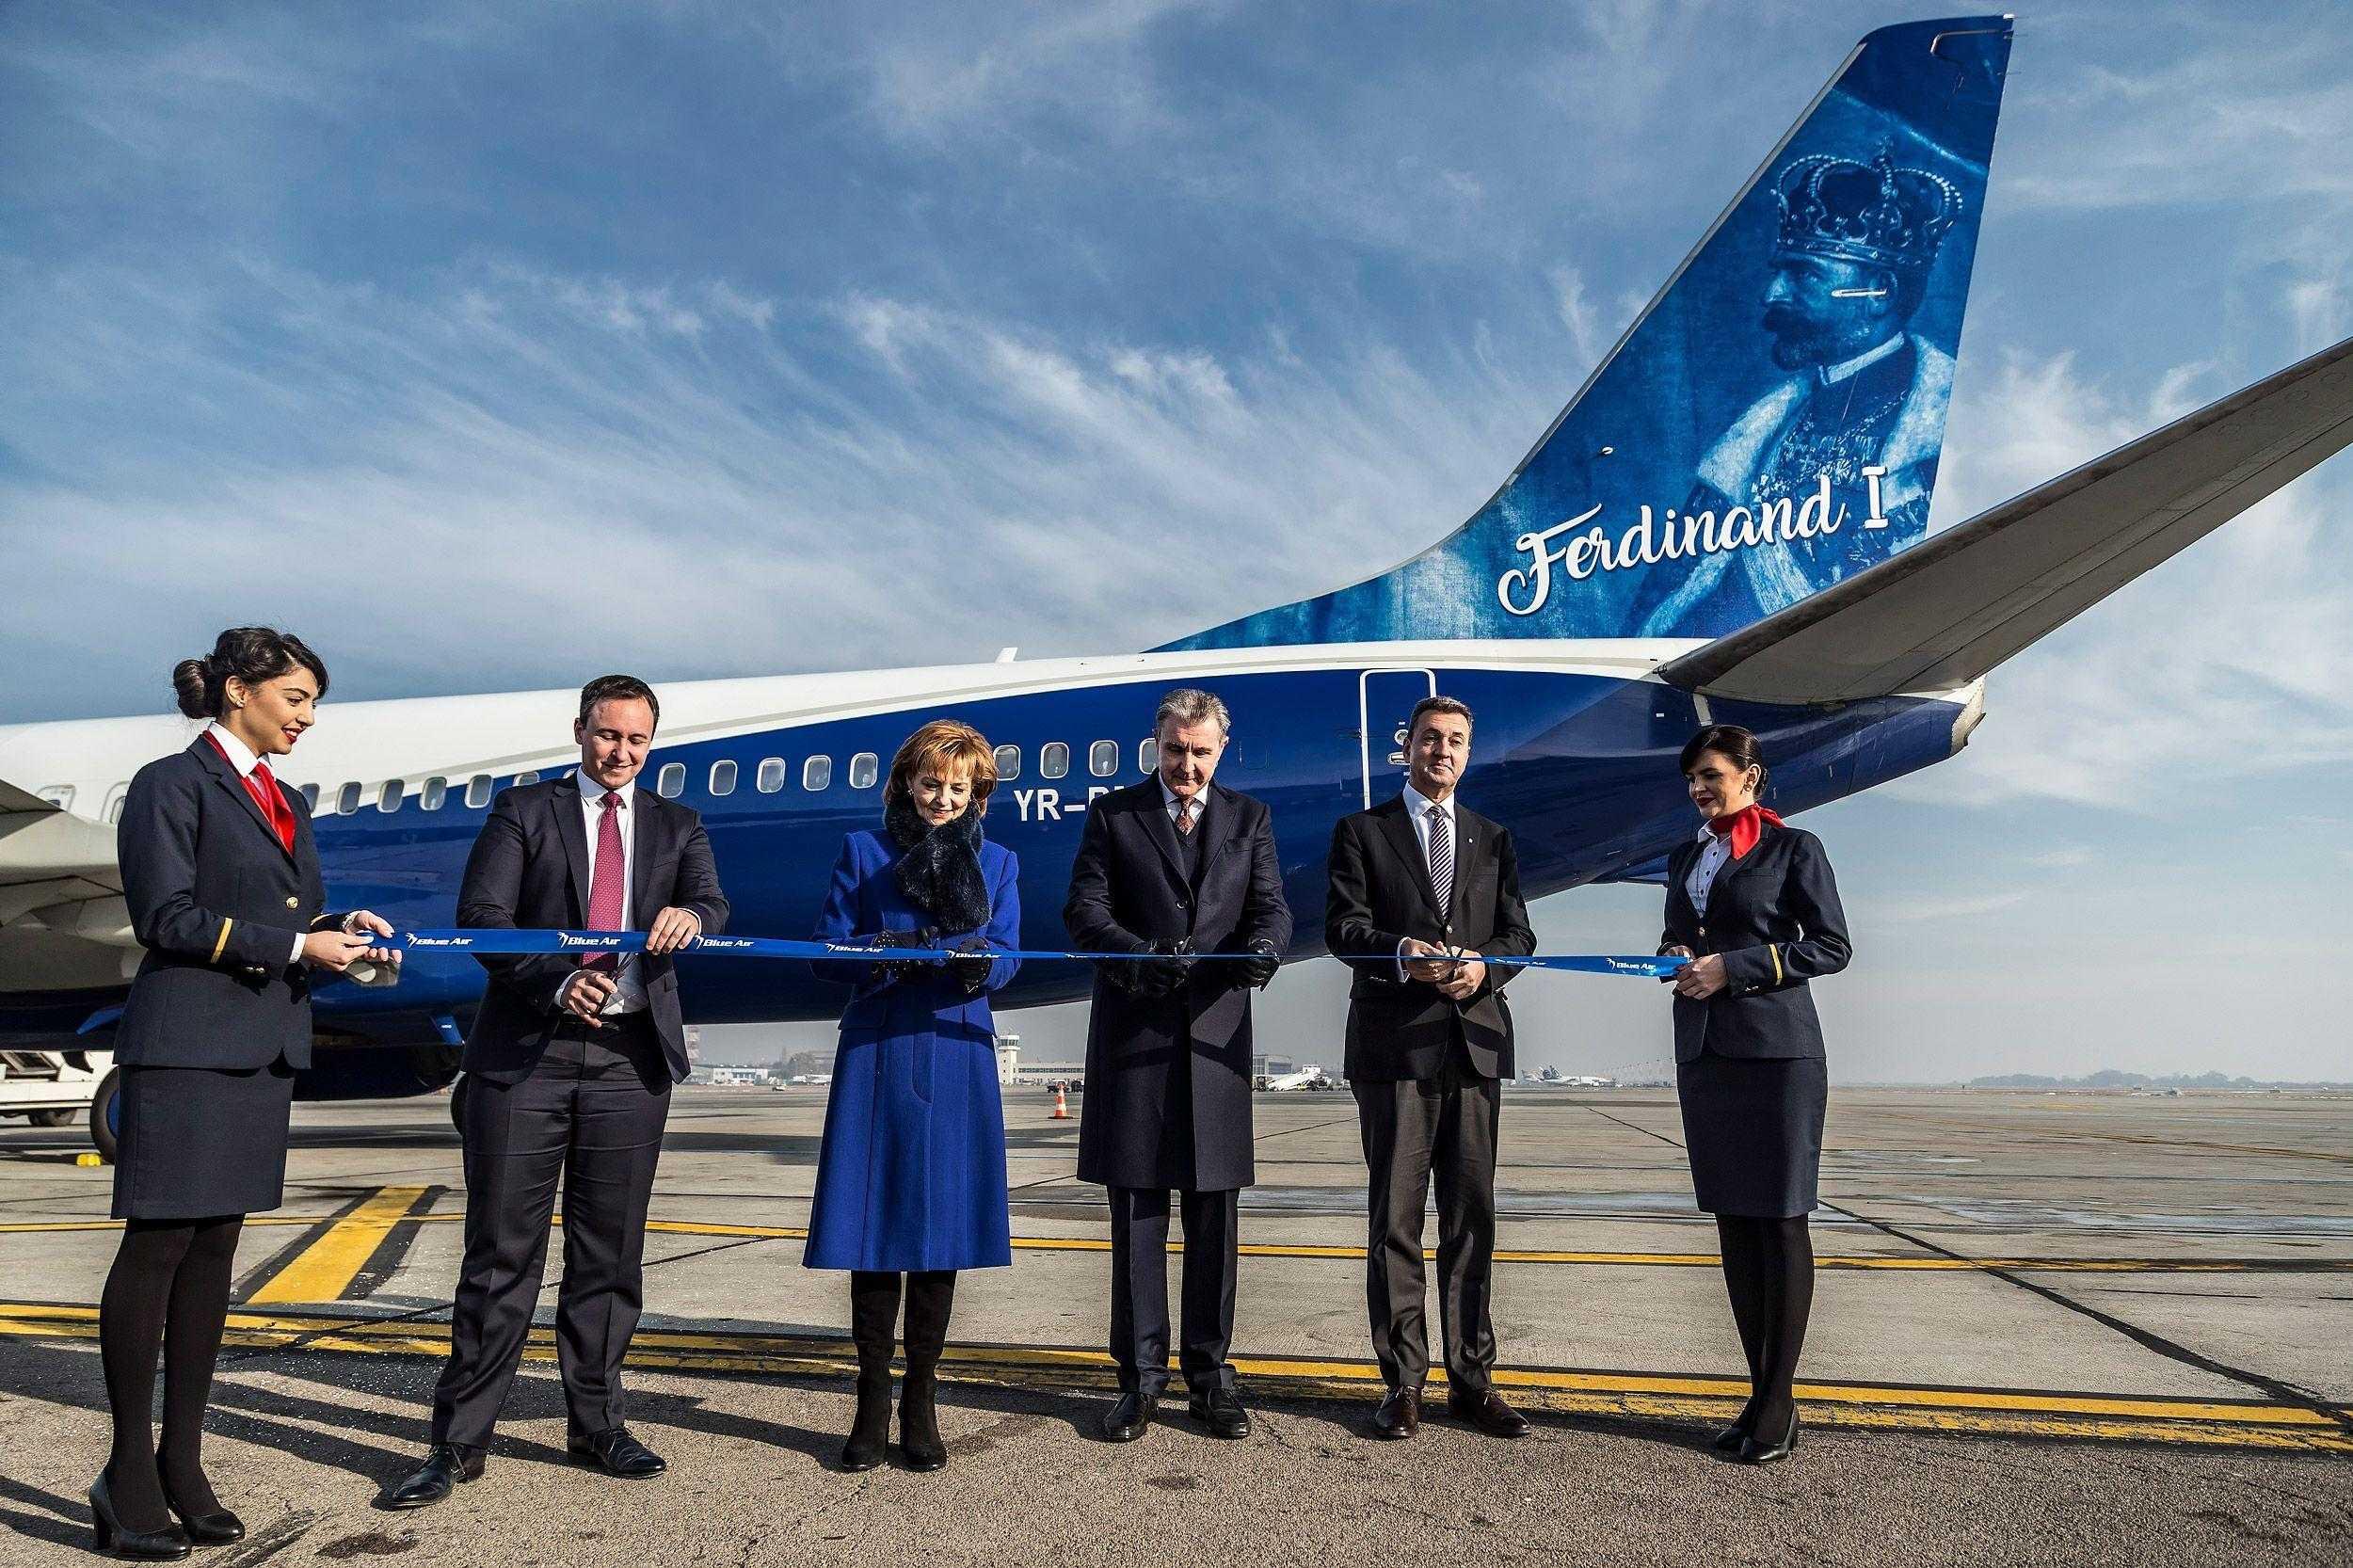 boeing-737-800-blue-air-ferdinand-1.jpg